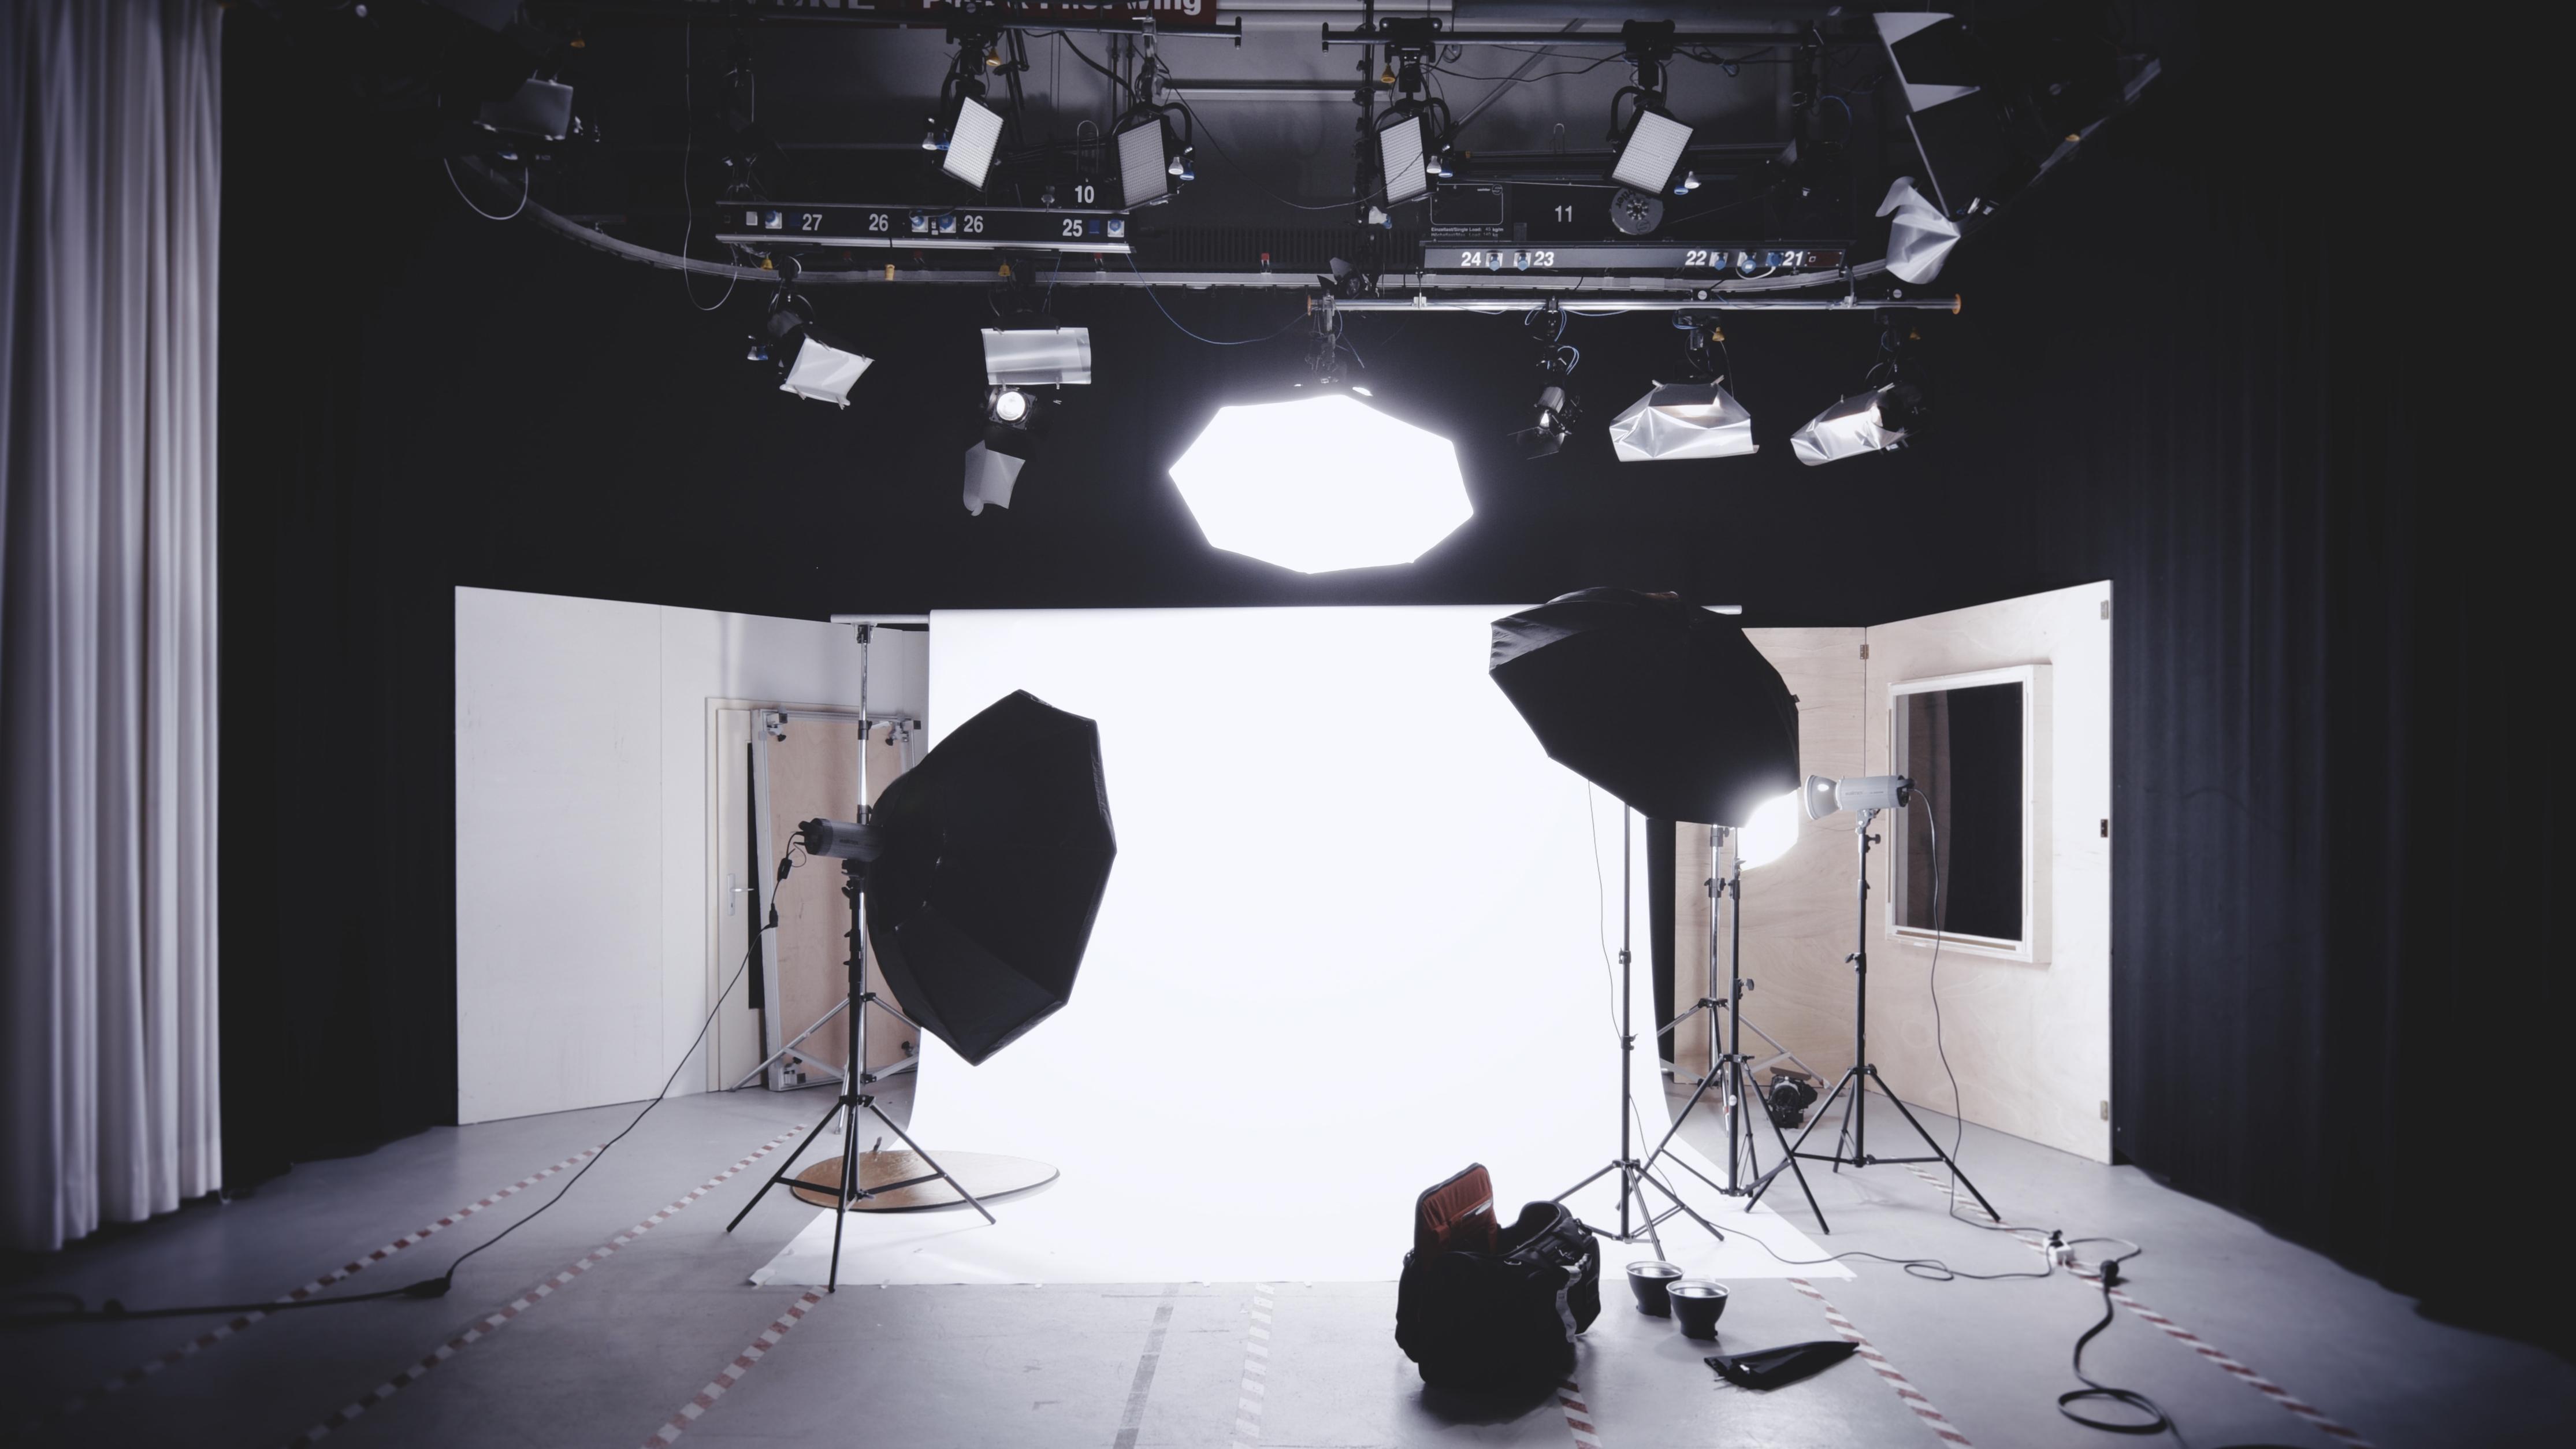 https://get.pxhere.com/photo/work-working-technology-photography-studio-black-furniture-room-lighting-interior-design-indoors-flash-lights-design-mirror-contemporary-softbox-workplace-photo-shoot-spotlights-916982.jpg